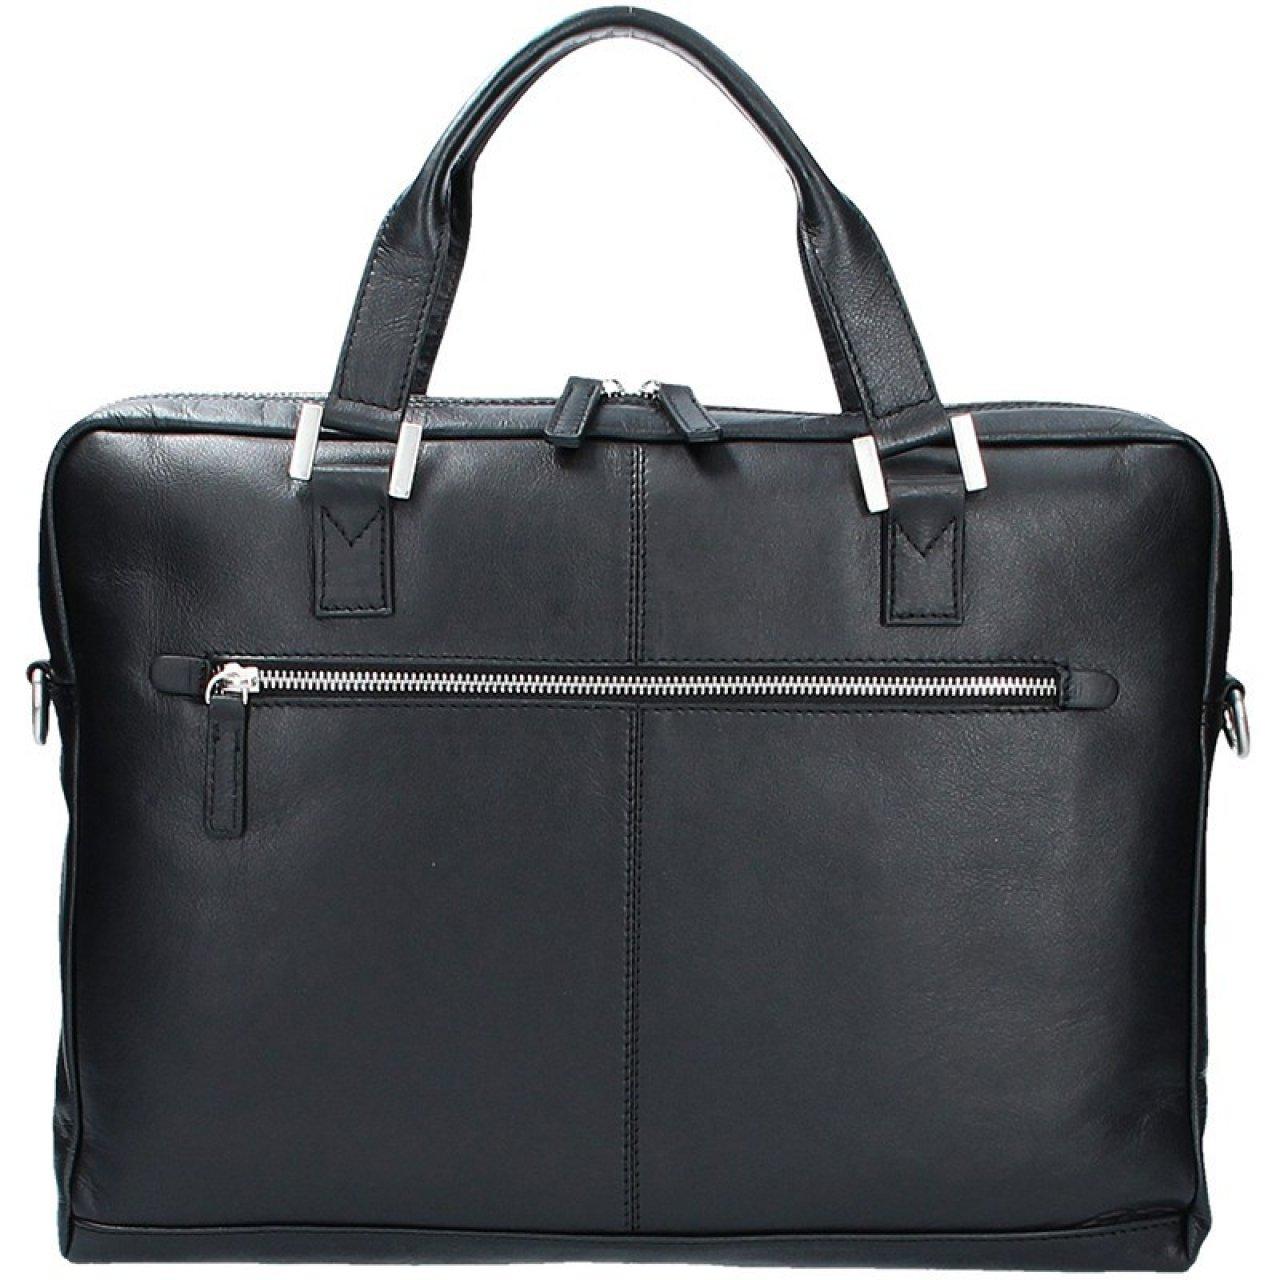 6c7b8a14429 Pánská kožená taška přes rameno Bugatti Manhattan - černá